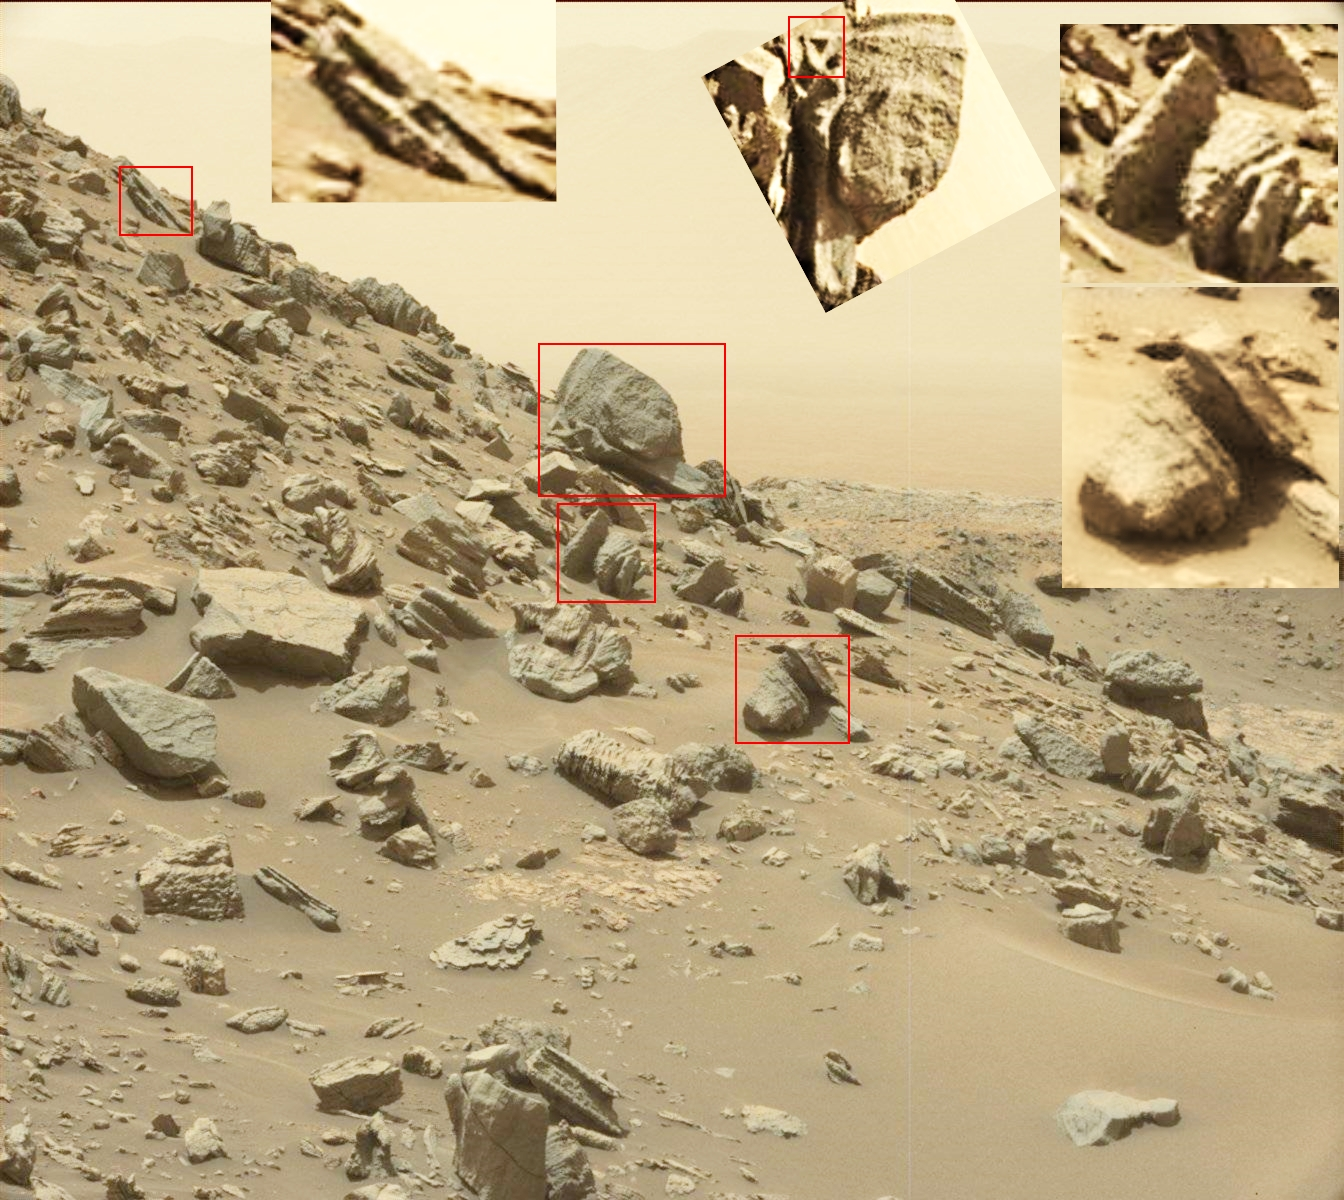 Mars curiosity rover msl rock pia21041 full